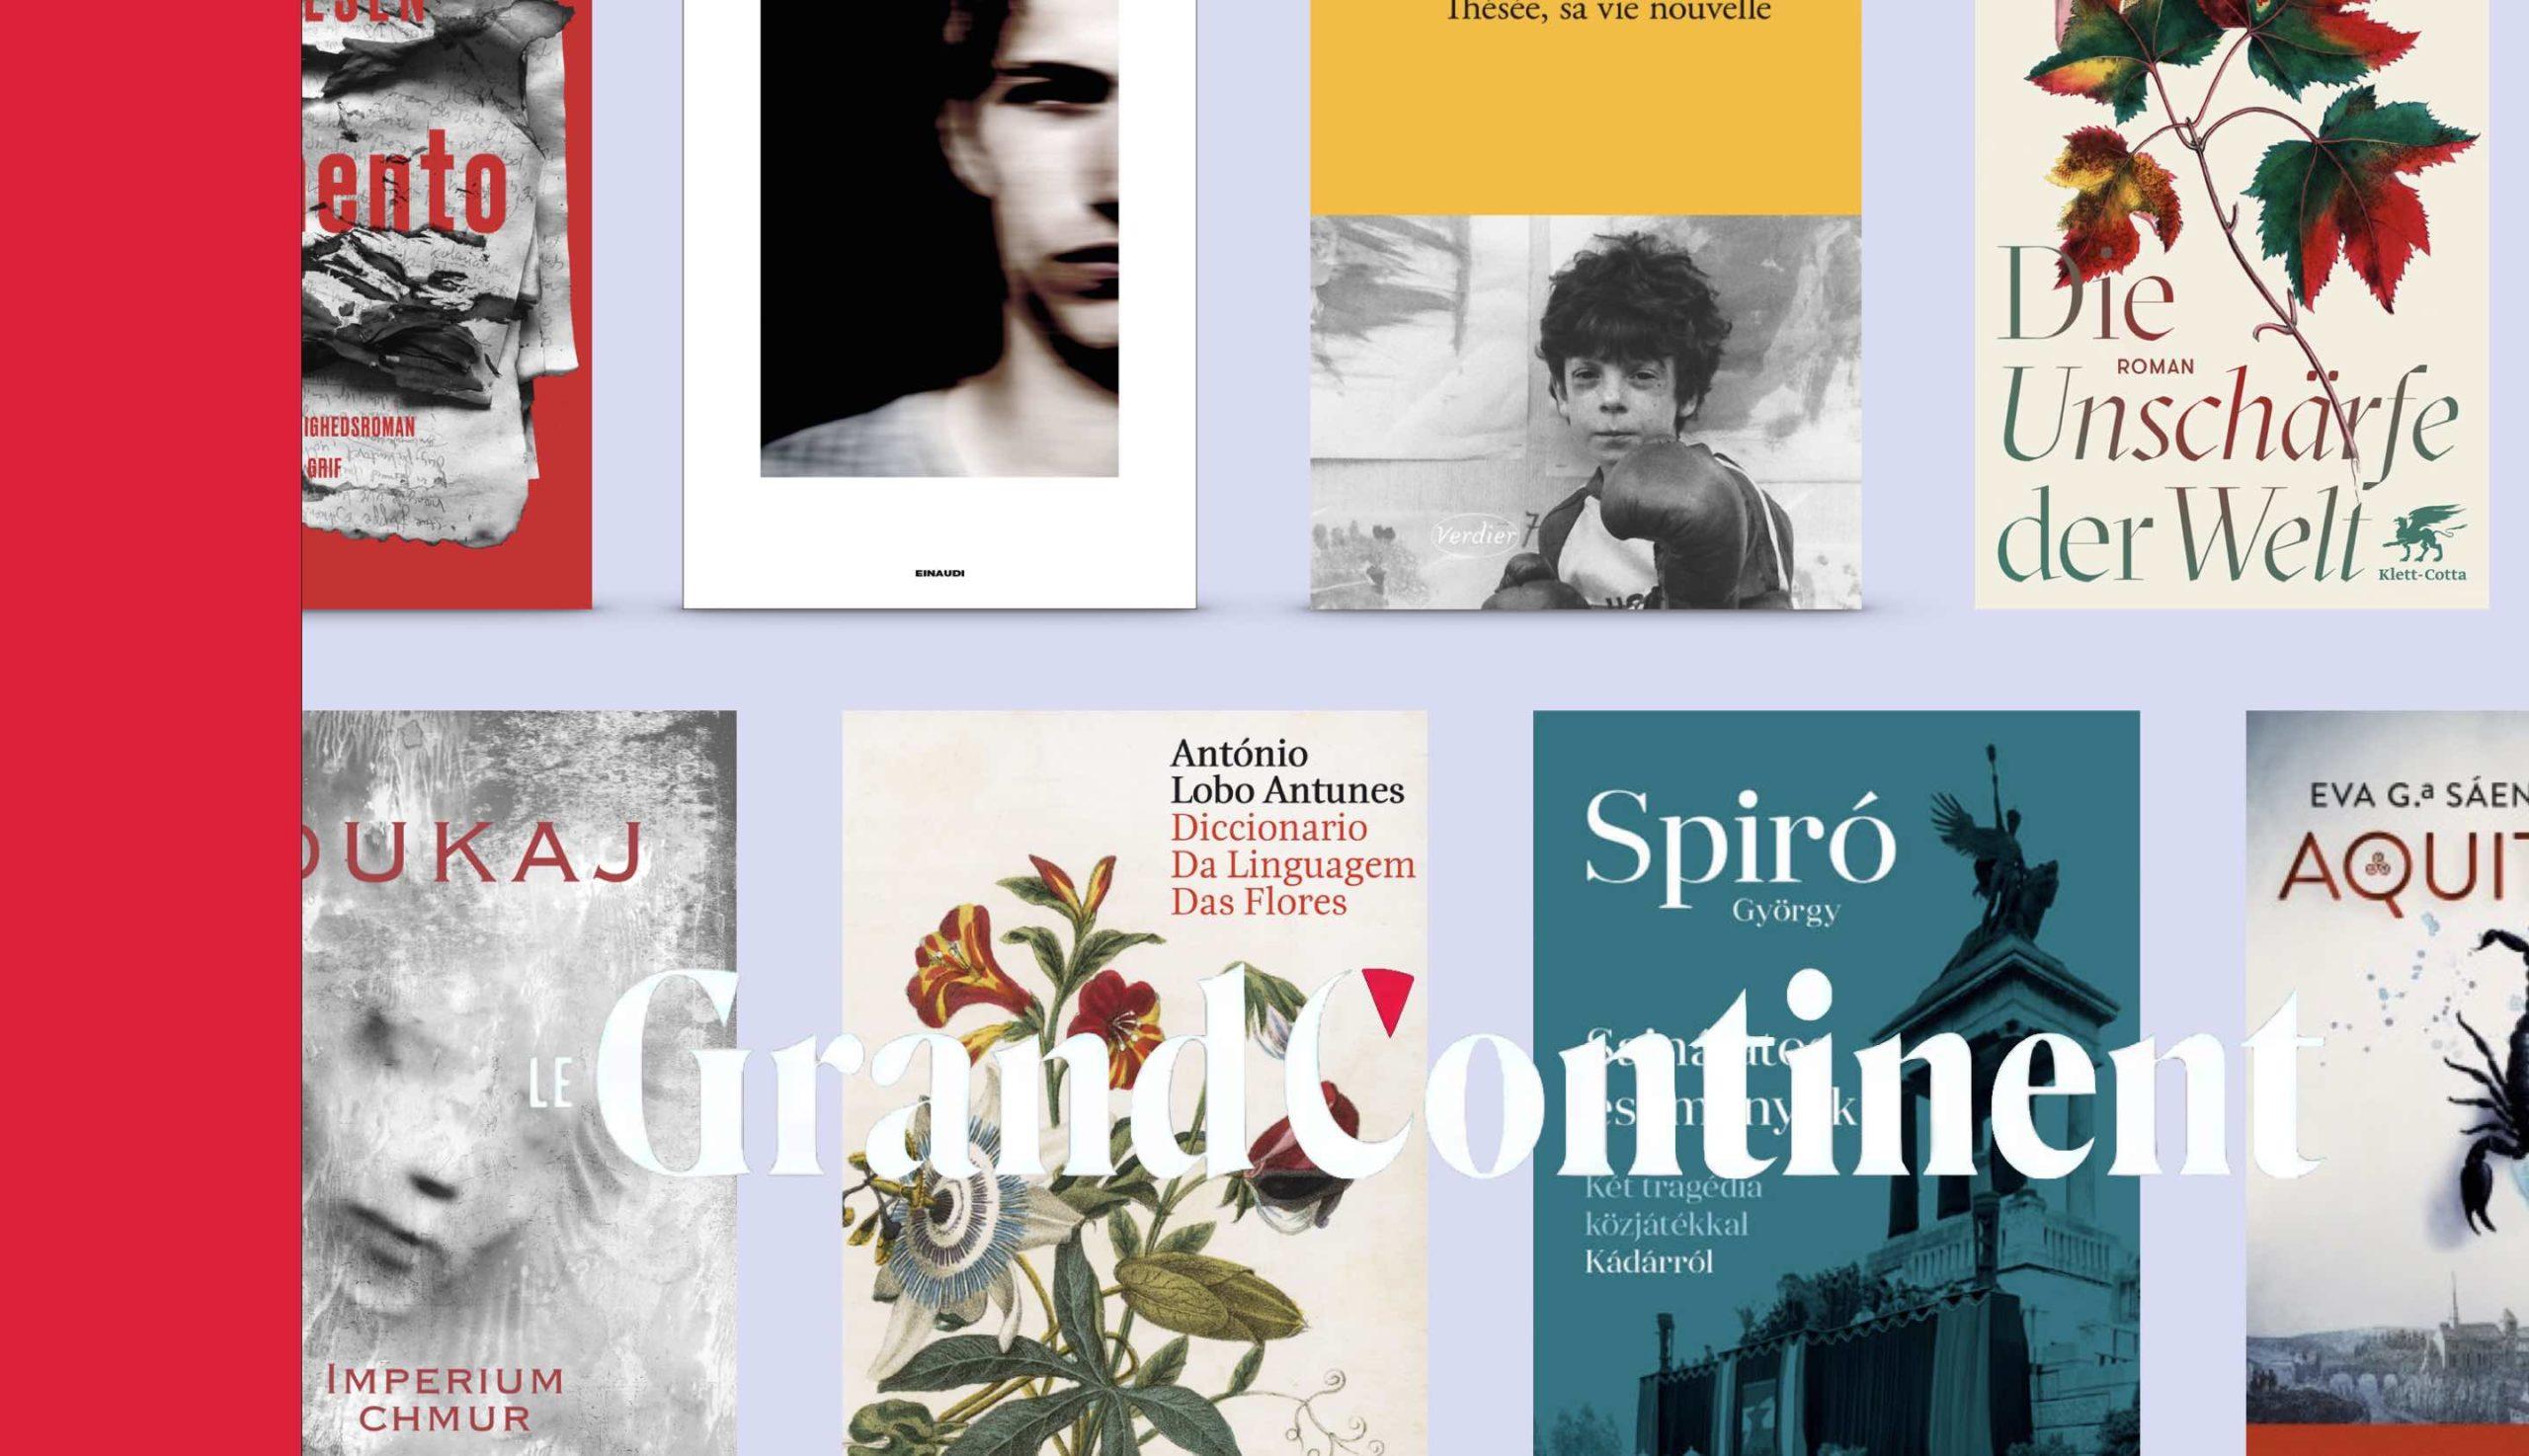 15 Fictions D Europe A Lire En Novembre Le Grand Continent